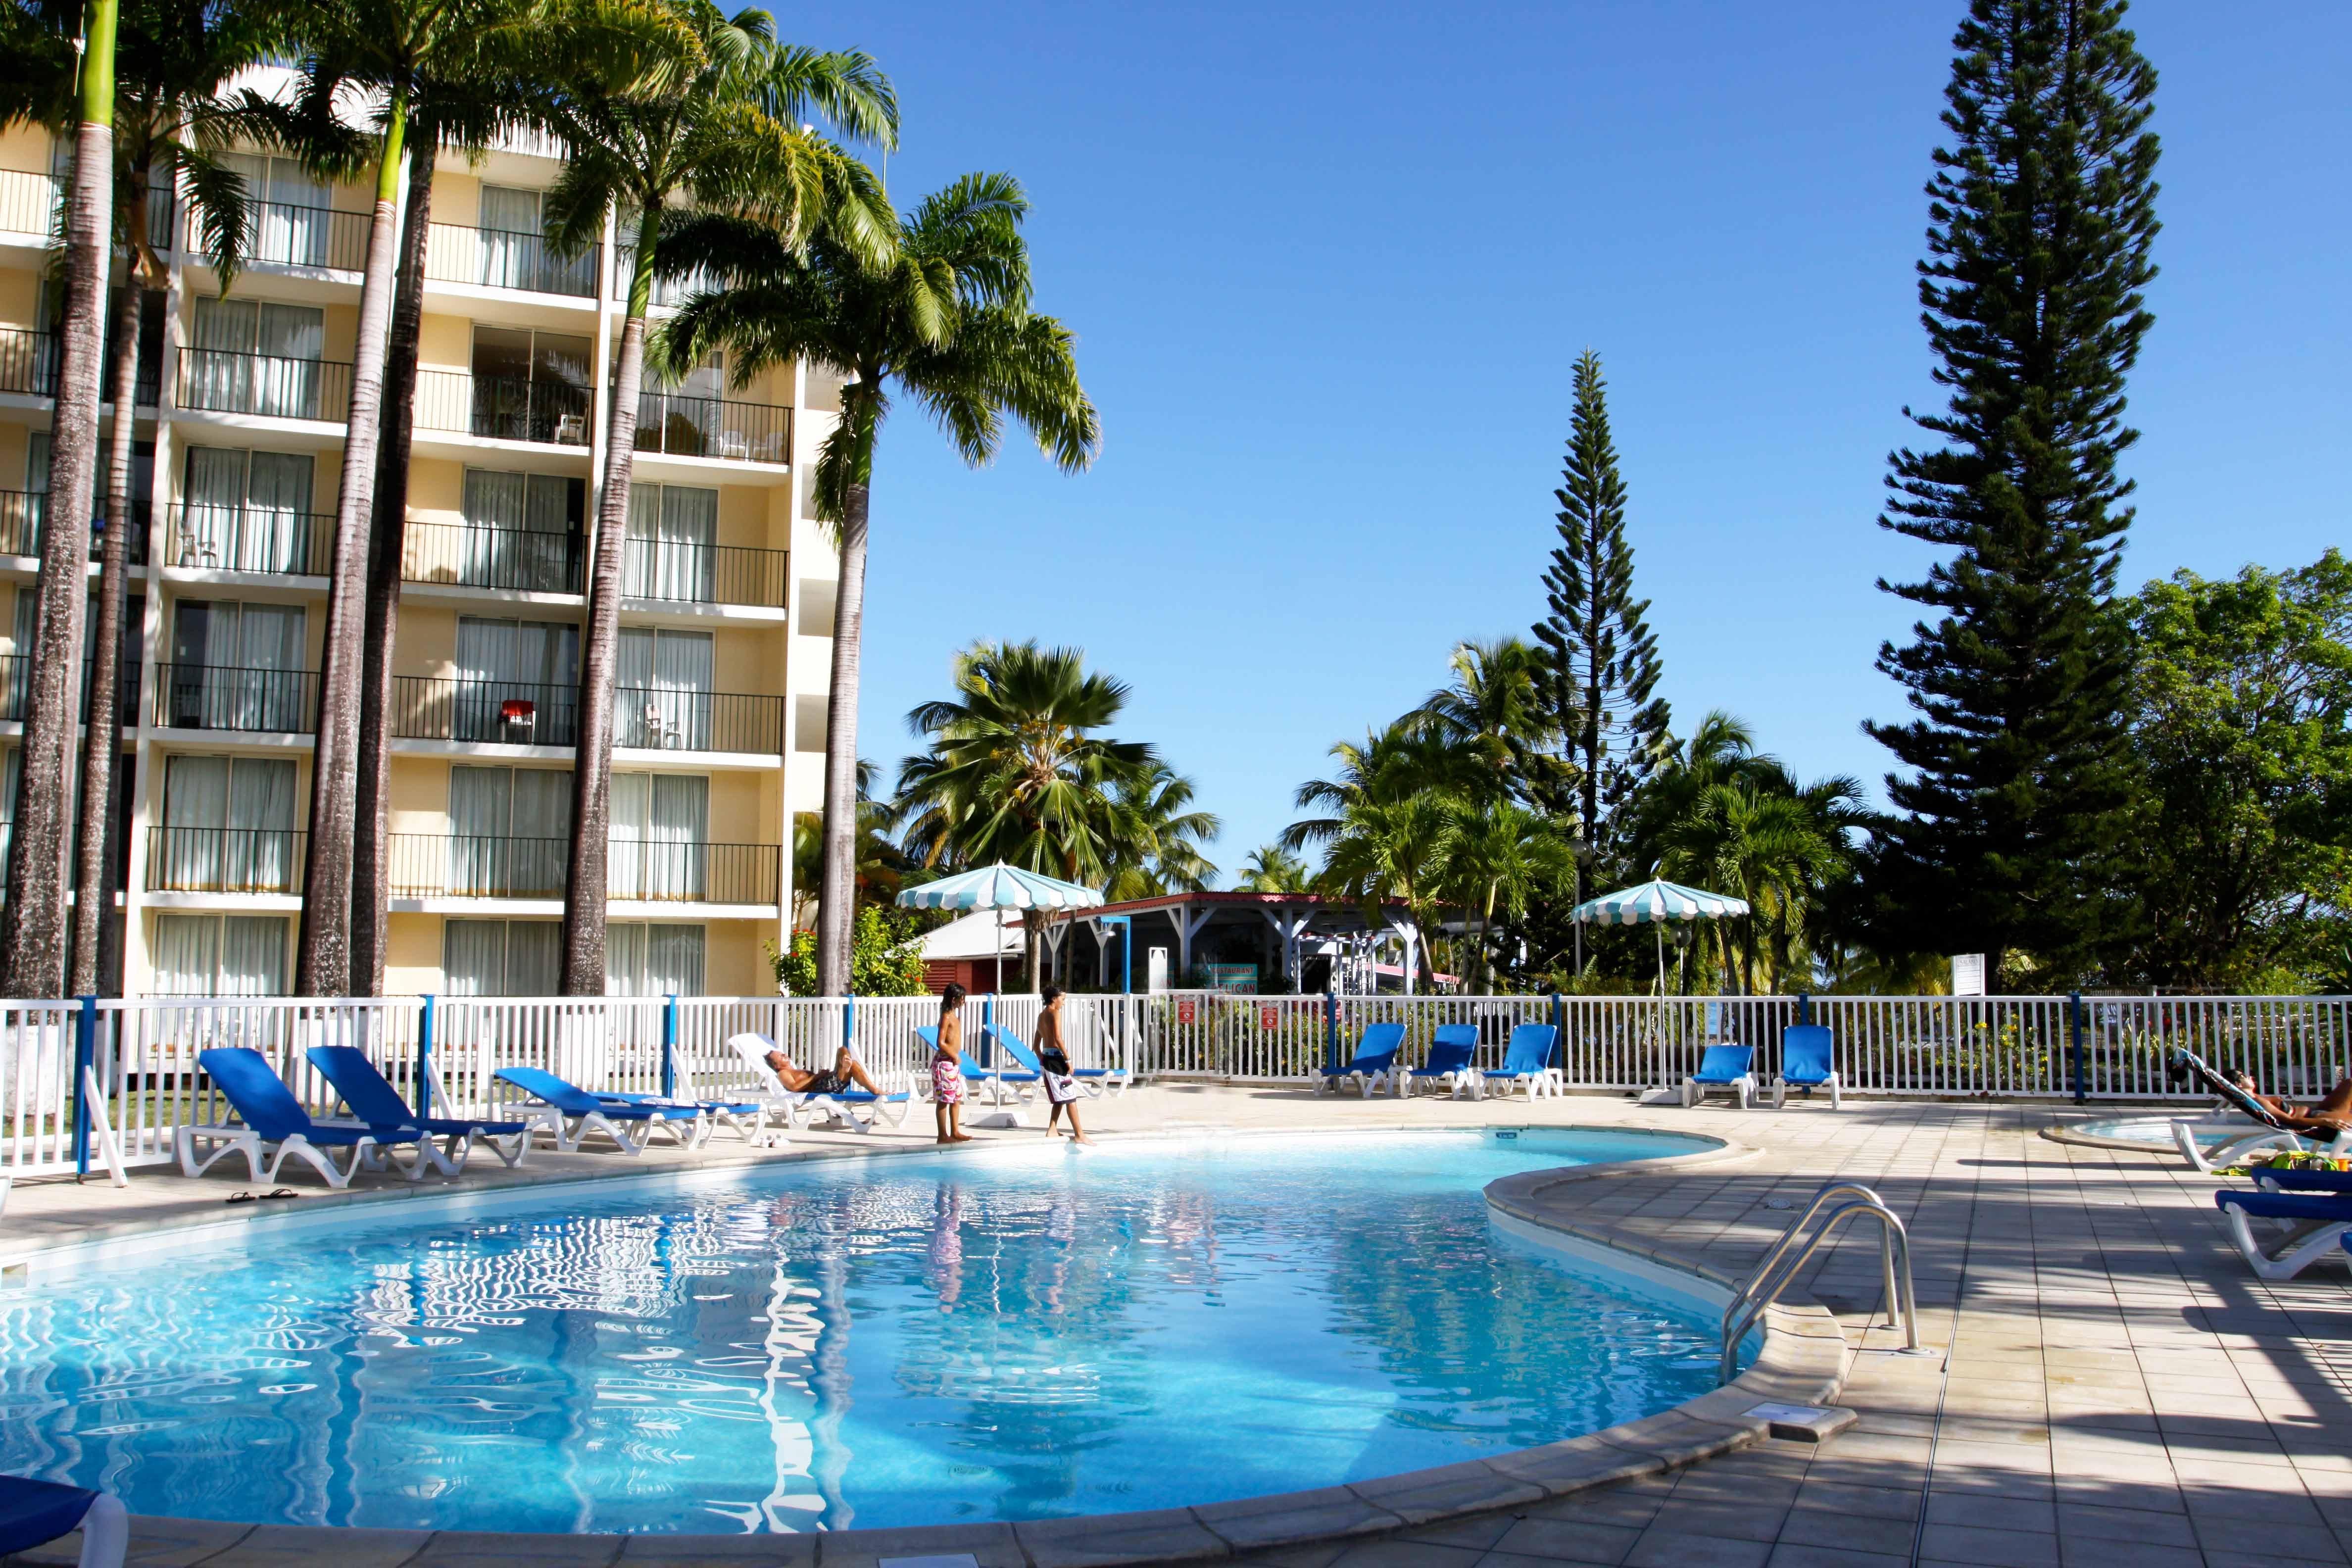 Hotel salako guadeloupe karib a beach resort goiser for Hotels guadeloupe